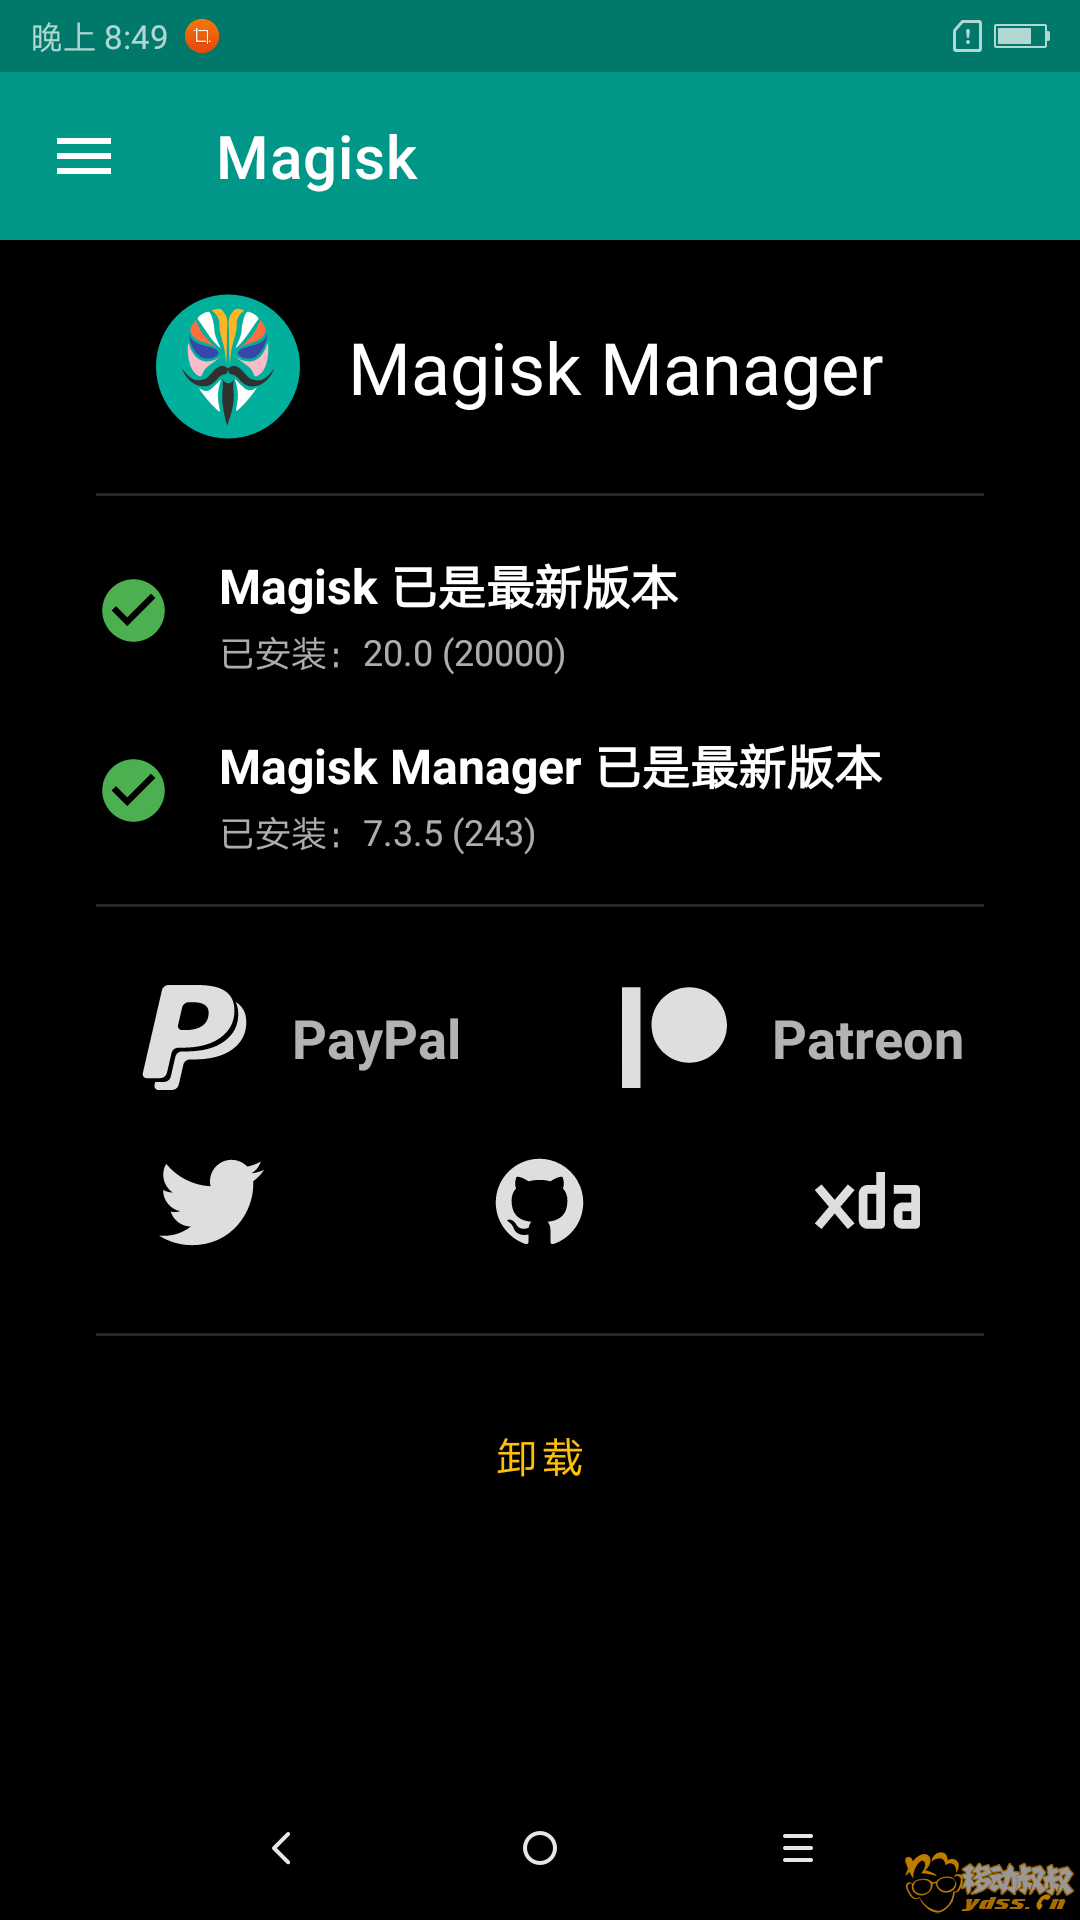 Screenshot_2019-11-30-20-49-18-0027023983.png